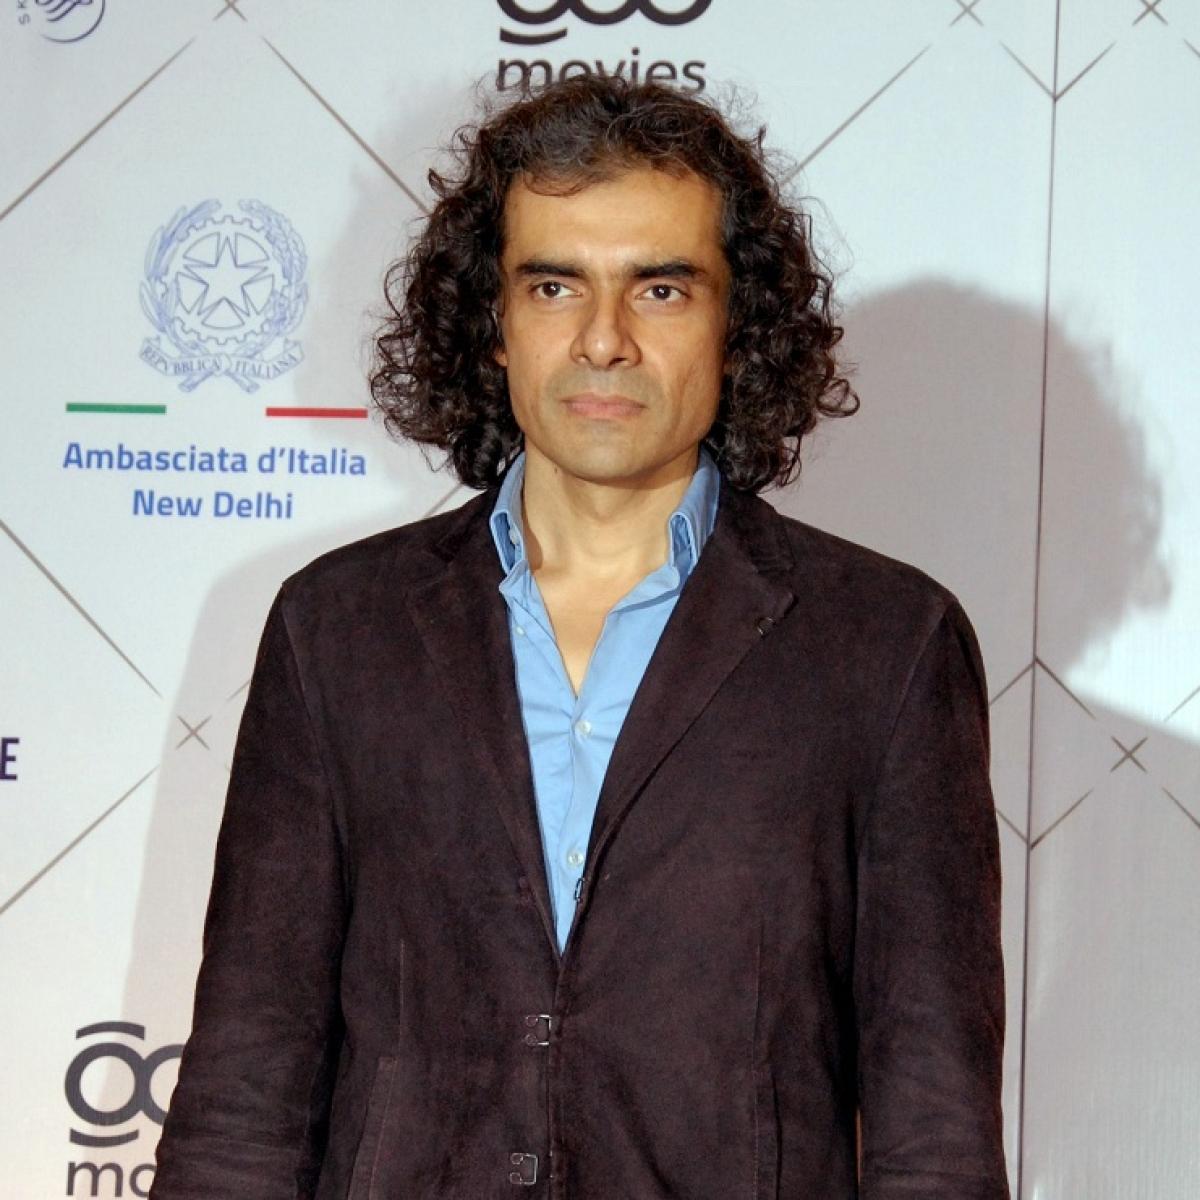 Saroj Khan behaved like a teenager on winning National Award for 'Jab We Met', says Imtiaz Ali